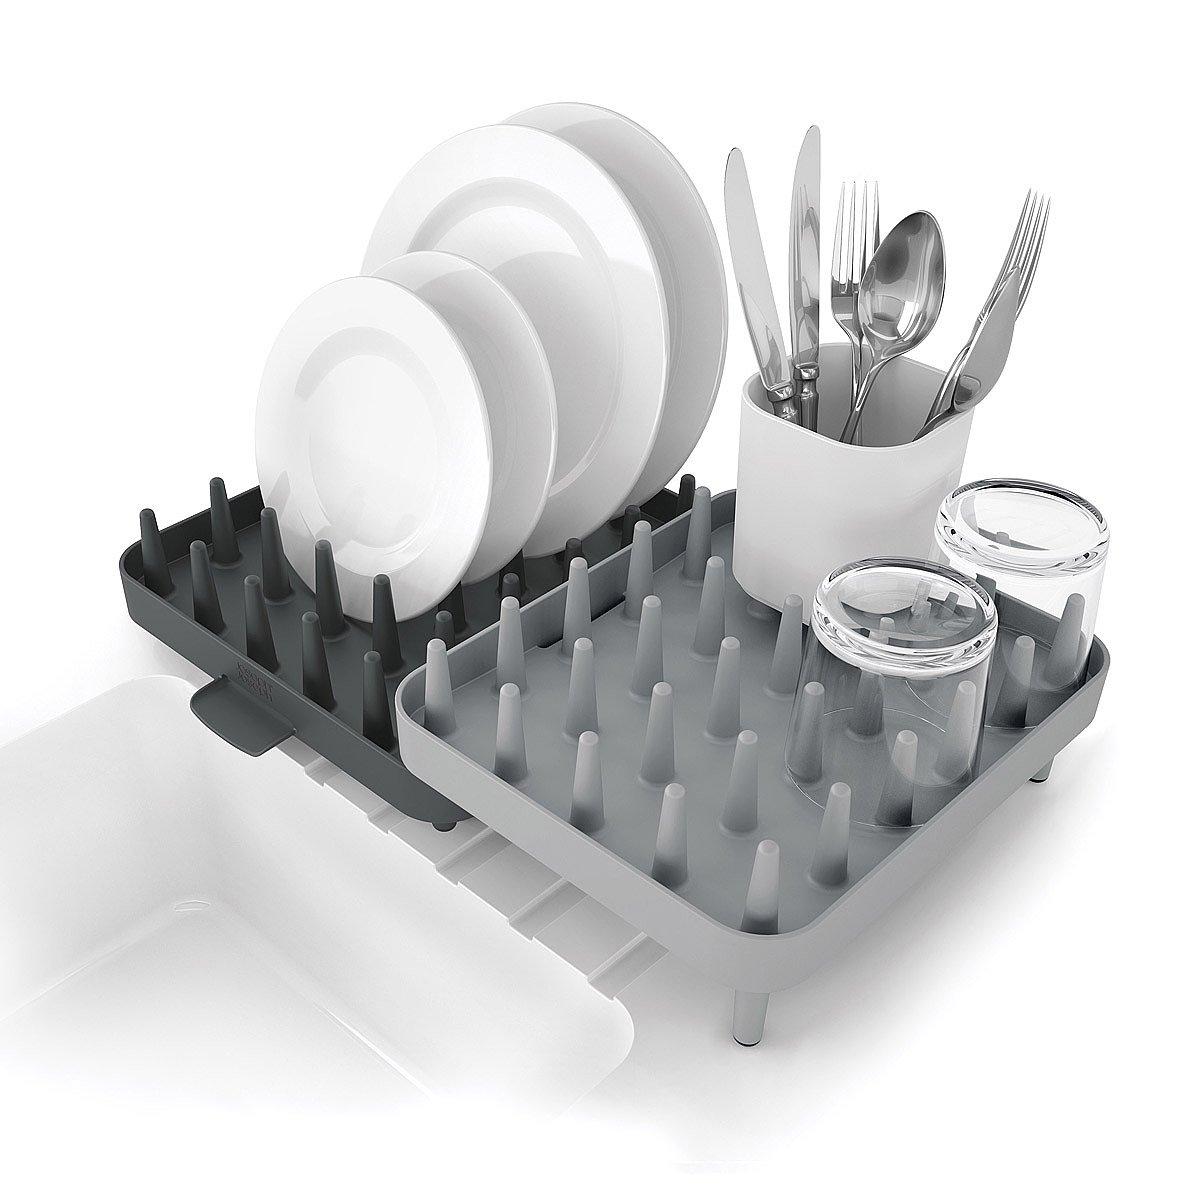 Adjustable 3 Piece Dish Rack 2 Thumbnail